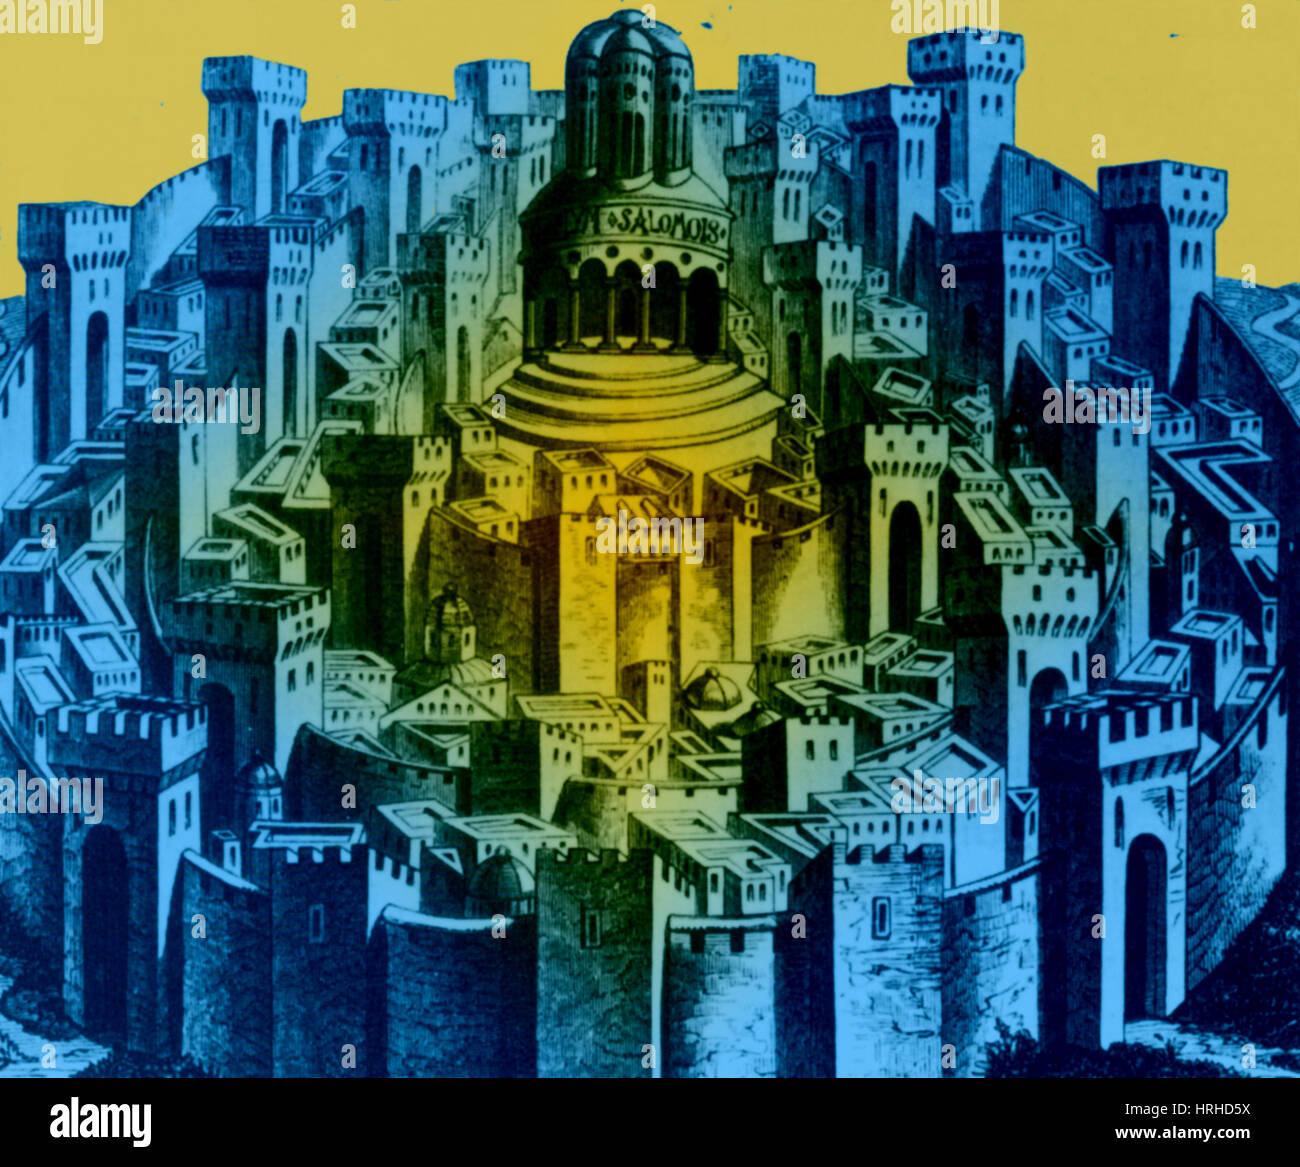 Século XV xilogravura de Jerusalém Imagens de Stock